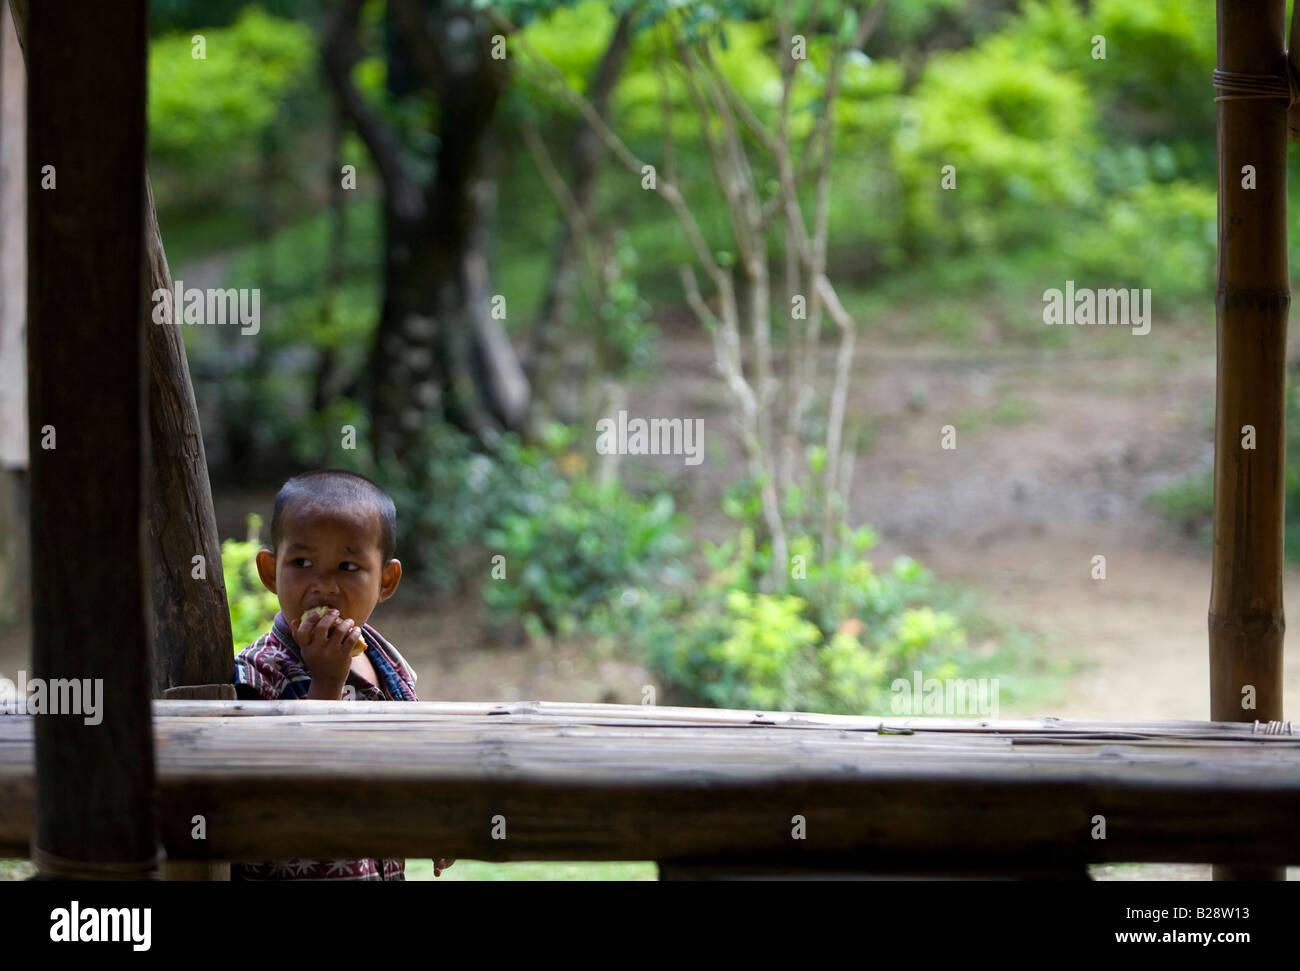 A Mangyan child eats a mango in the Panaytayan community near Mansalay, Oriental Mindoro, Philippines. - Stock Image